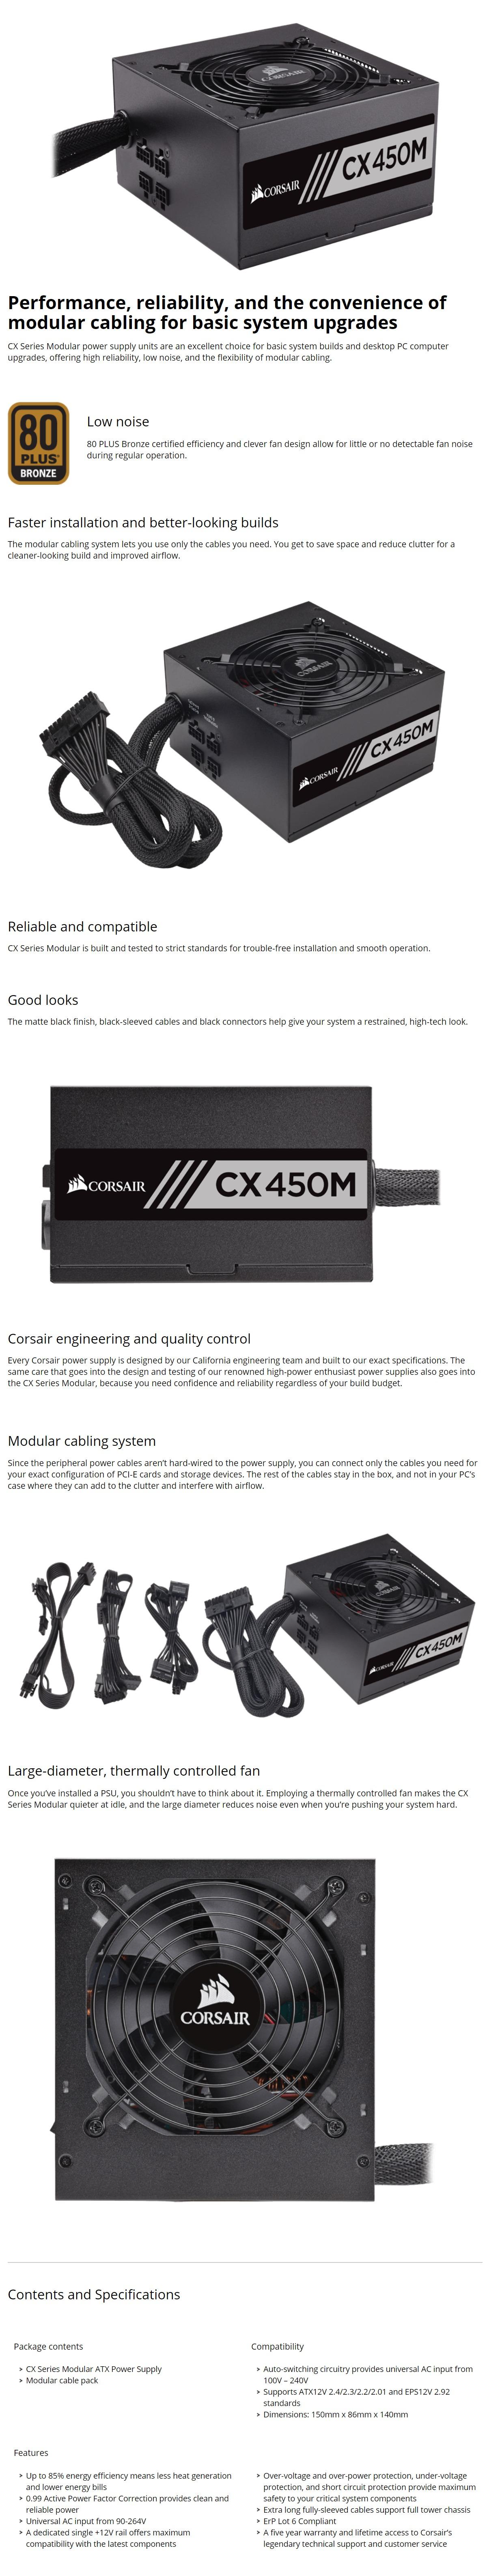 Corsair CX450M 80+ Bronze 450W ATX Power Supply